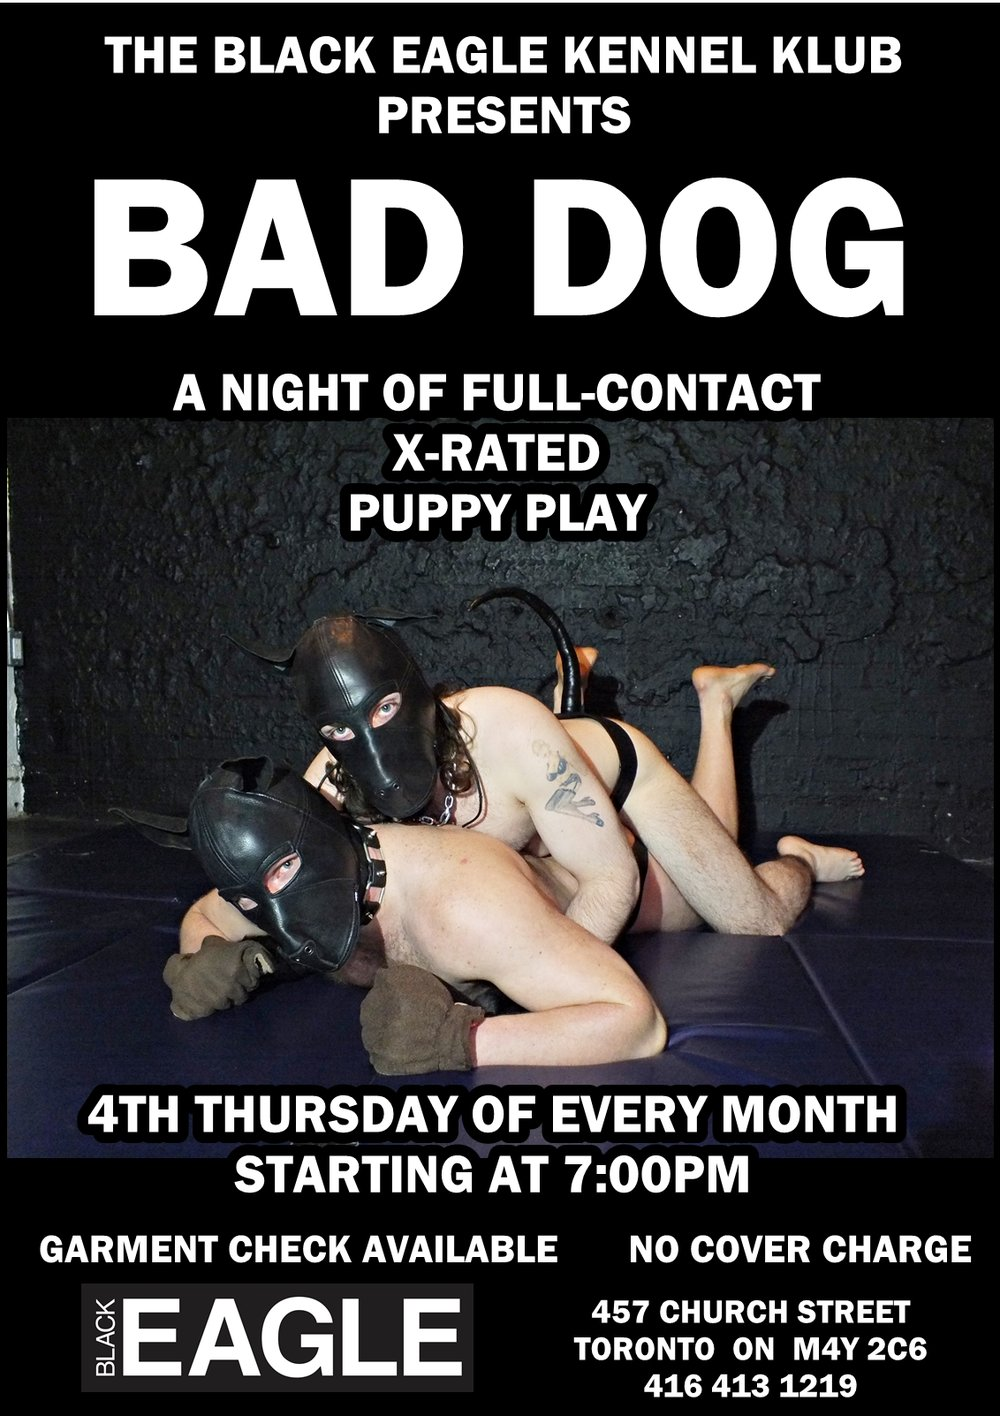 BAD DOG 2.jpg